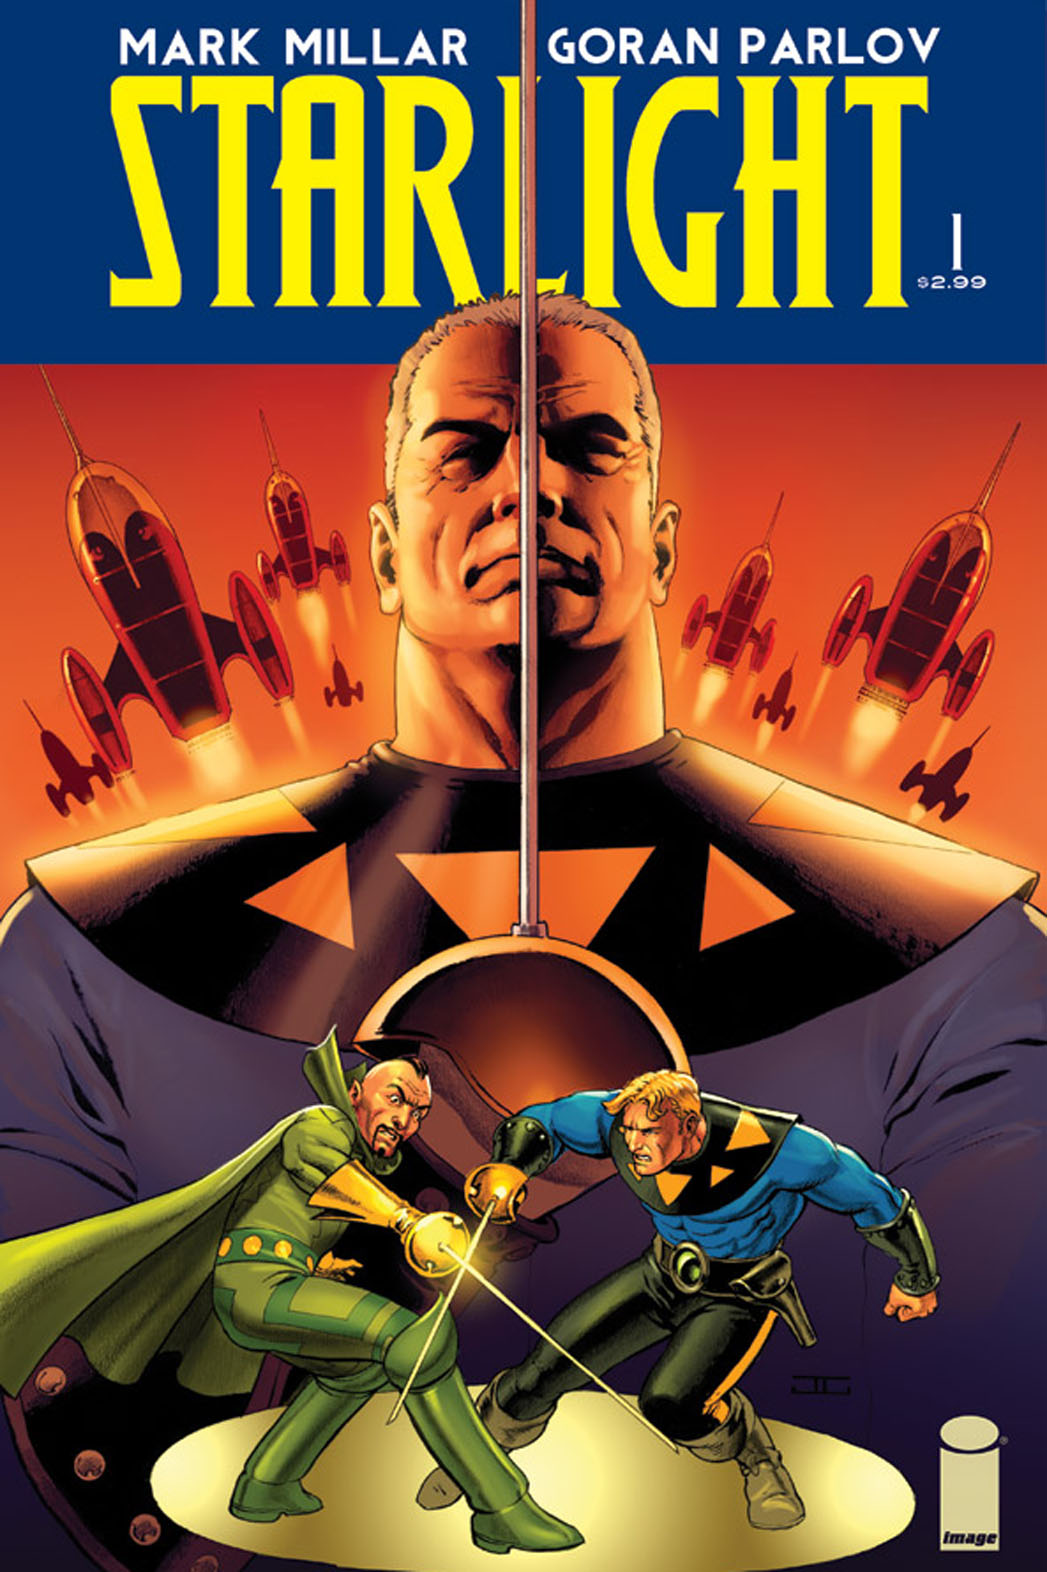 Starlight Cover Art - P 2014